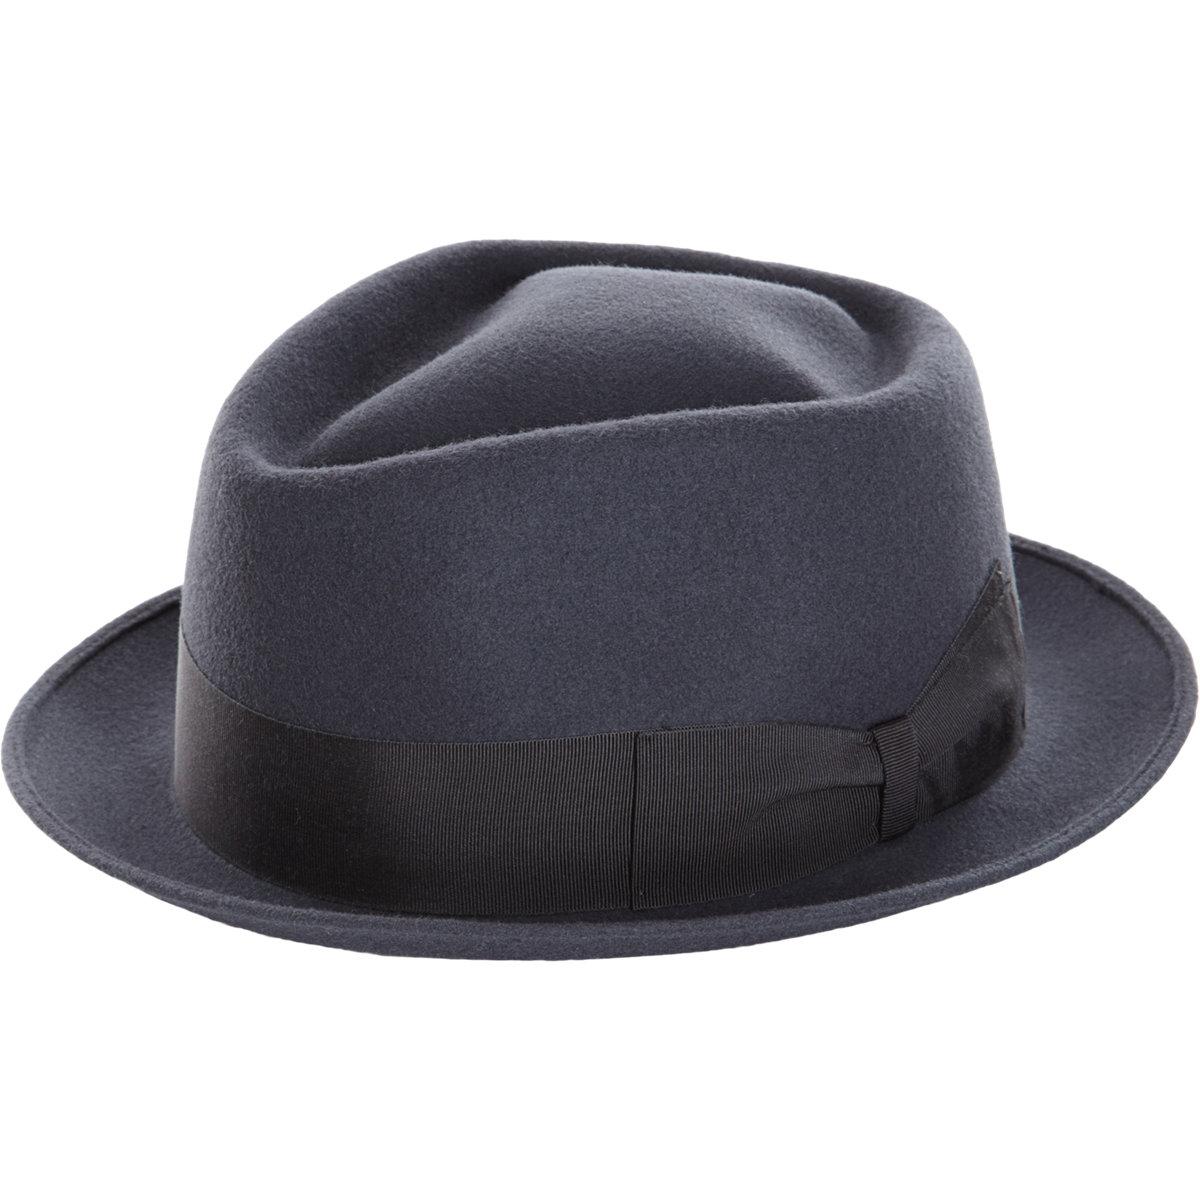 Hats :: Fedoras & Sun Hats :: Premium Multi Color Plaid ...  |Blue Black Band Fedora